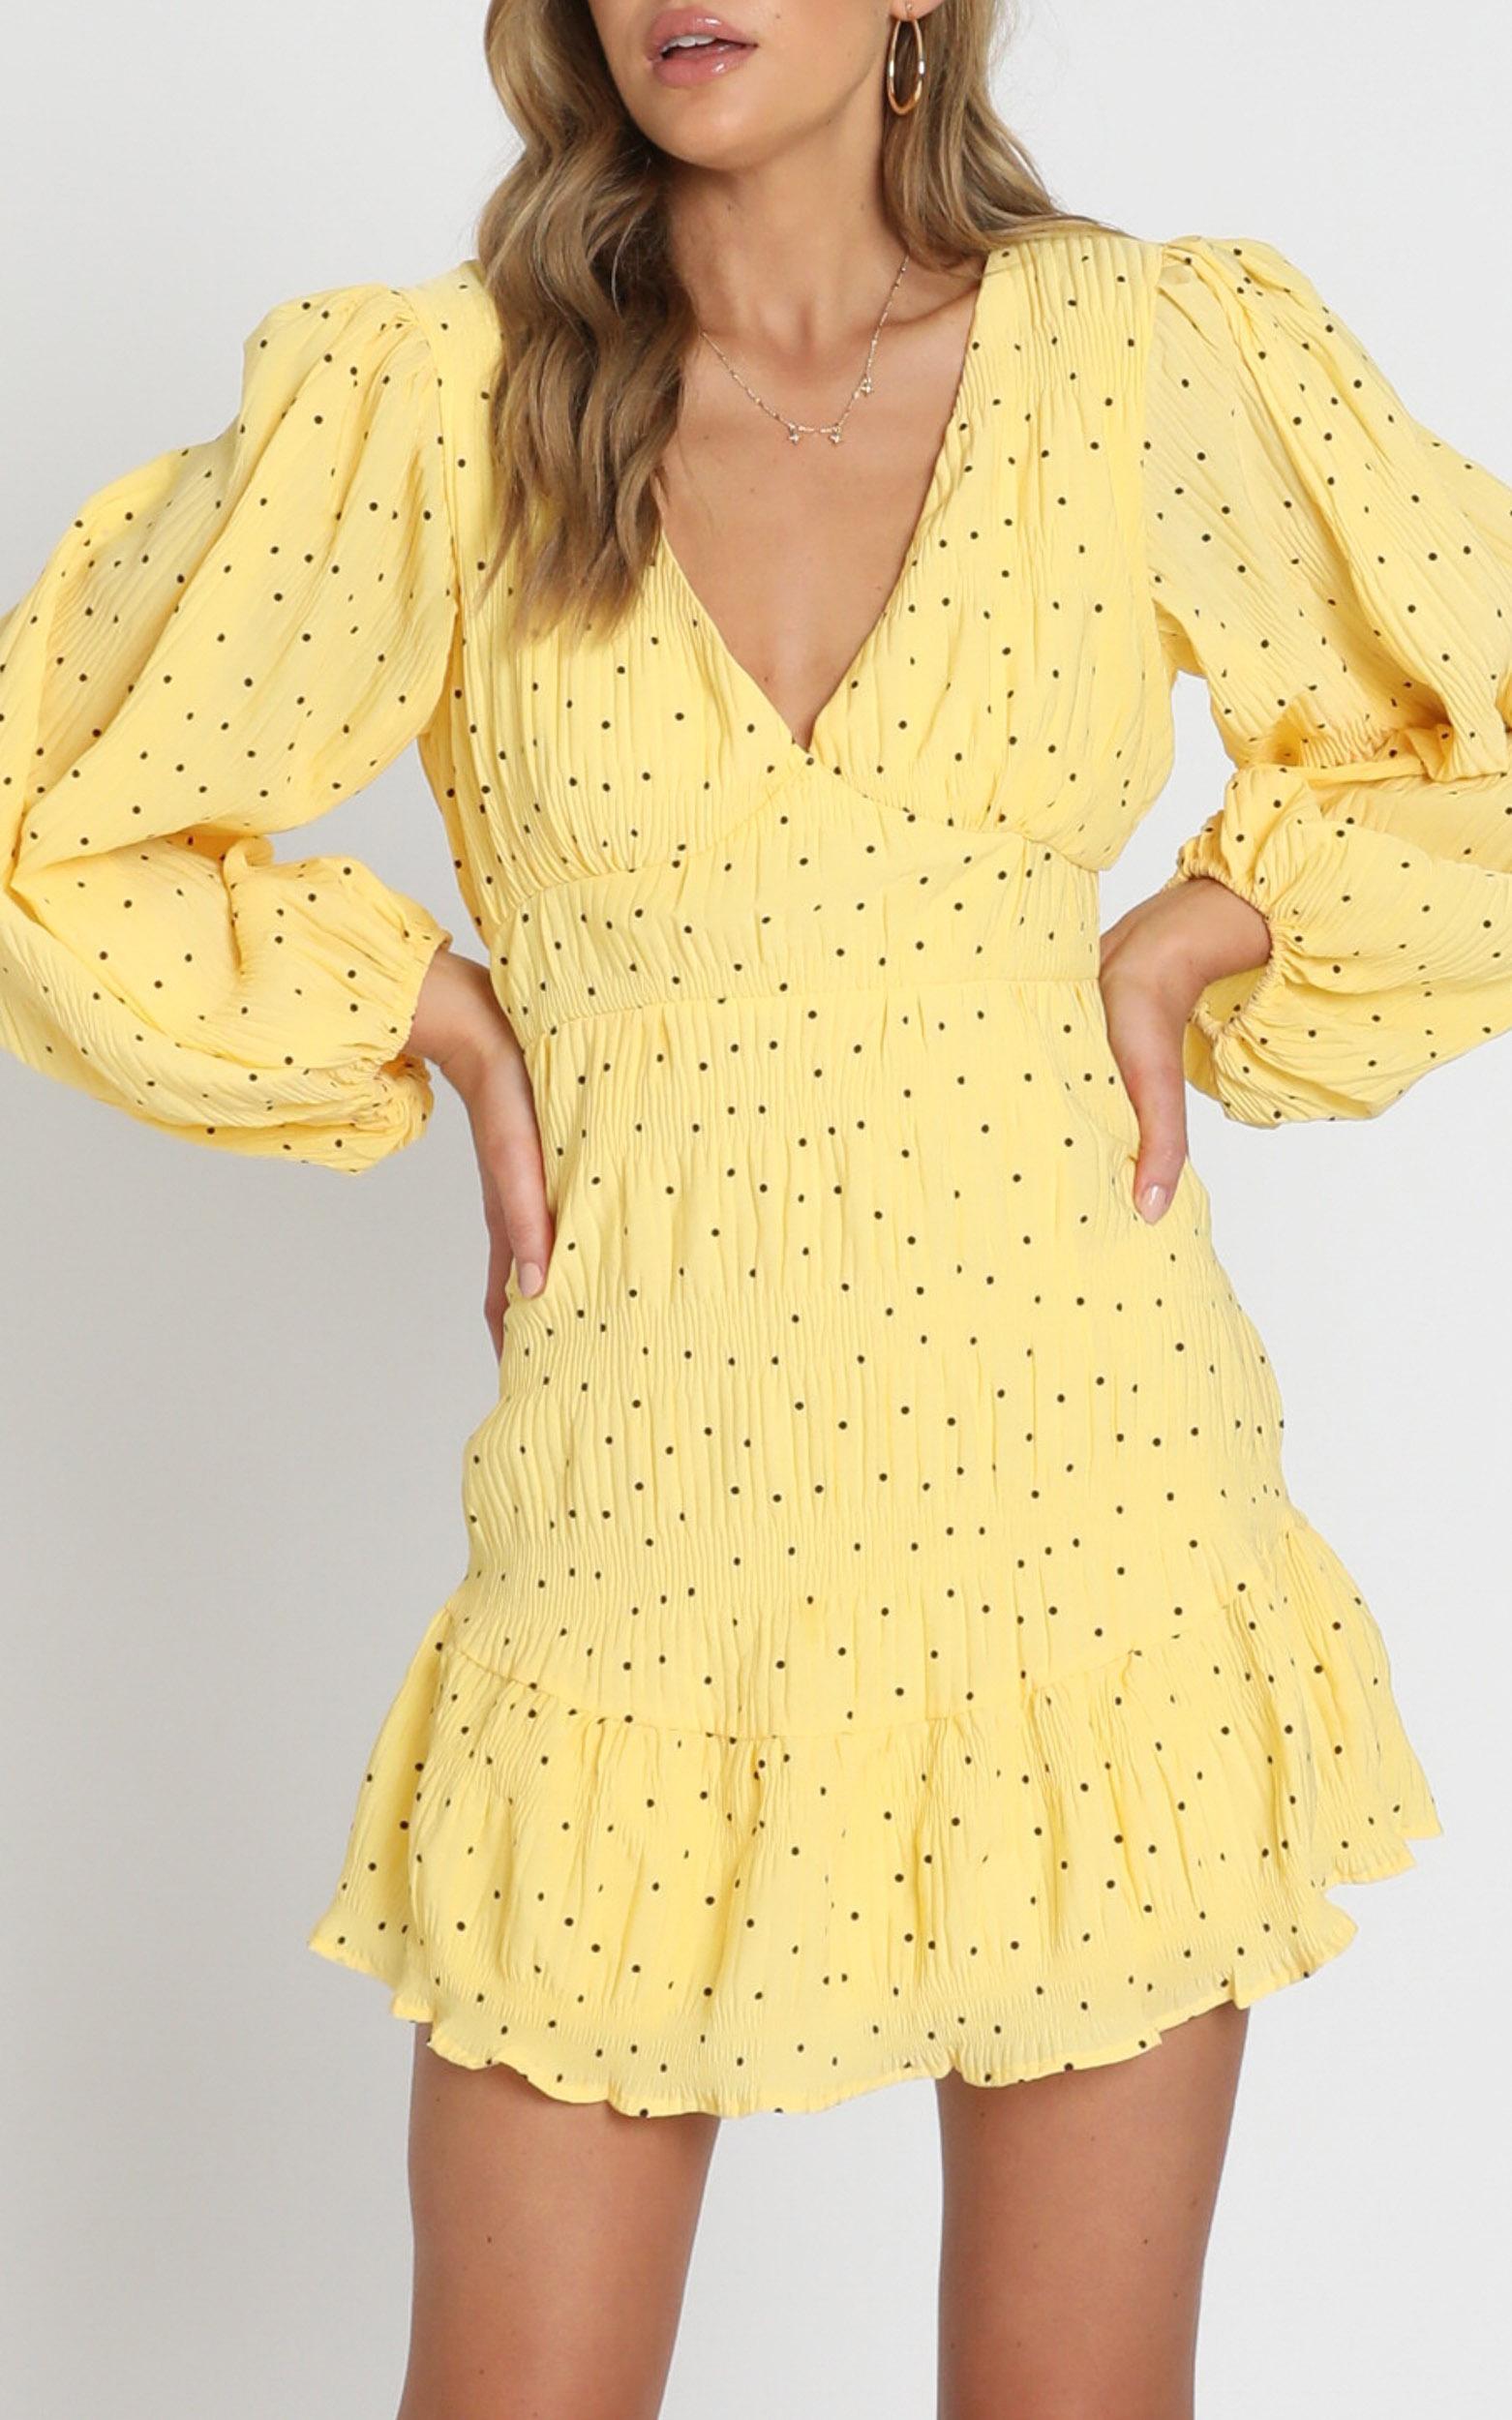 Alberta Dress in yellow spot - 6 (XS), Yellow, hi-res image number null